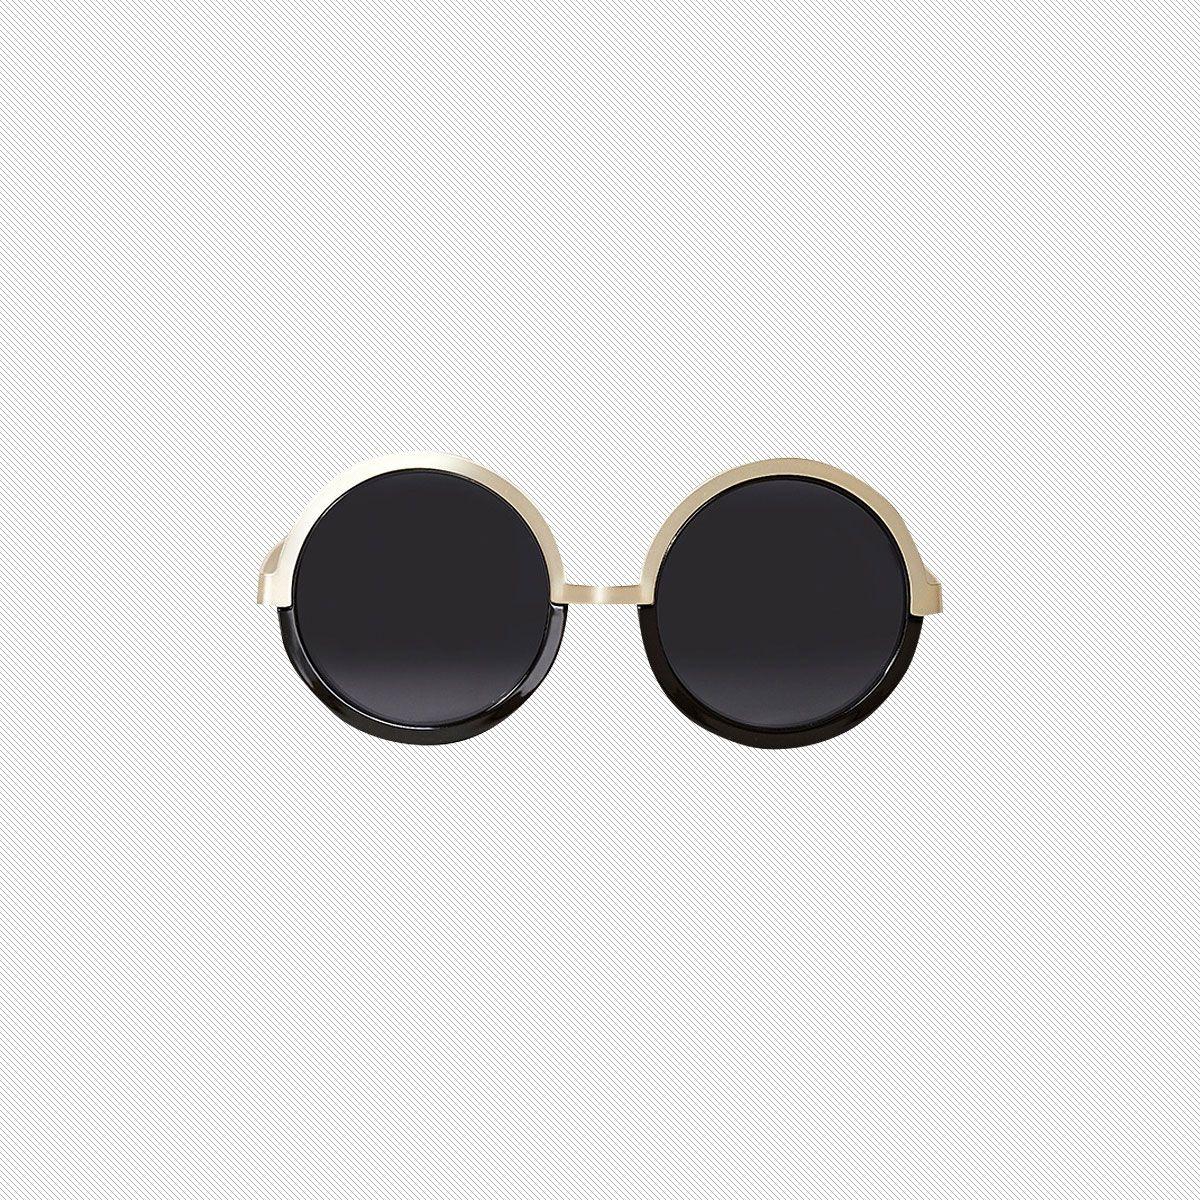 Twenty-Six Sunglasses for a Brighter Winter Ahead - The Cut